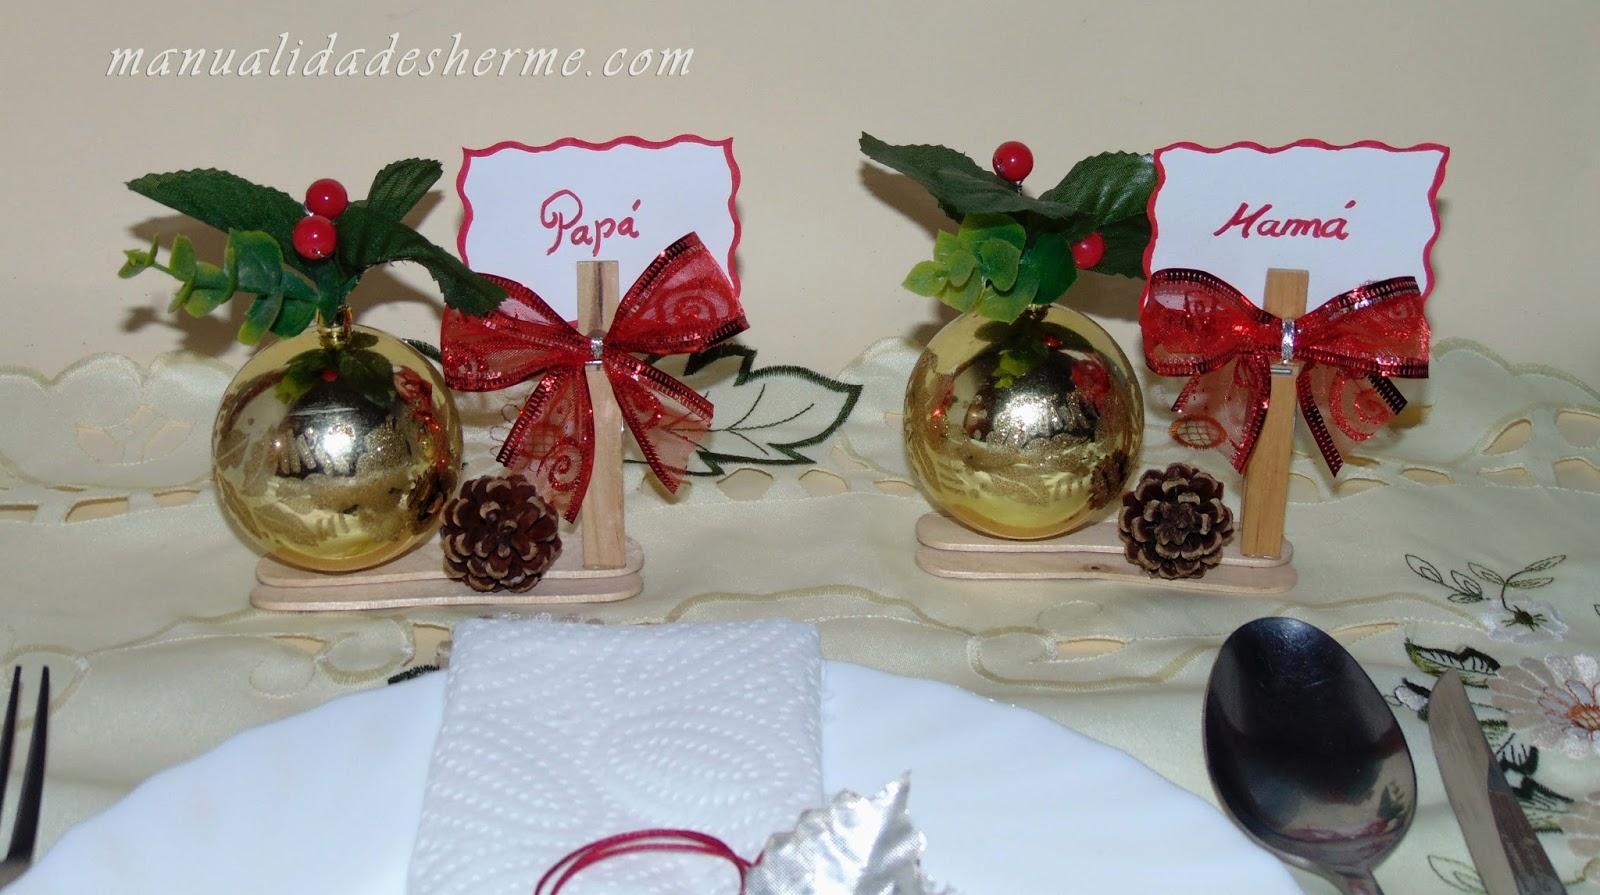 manualidades herme hacer carteles de mesa para navidad